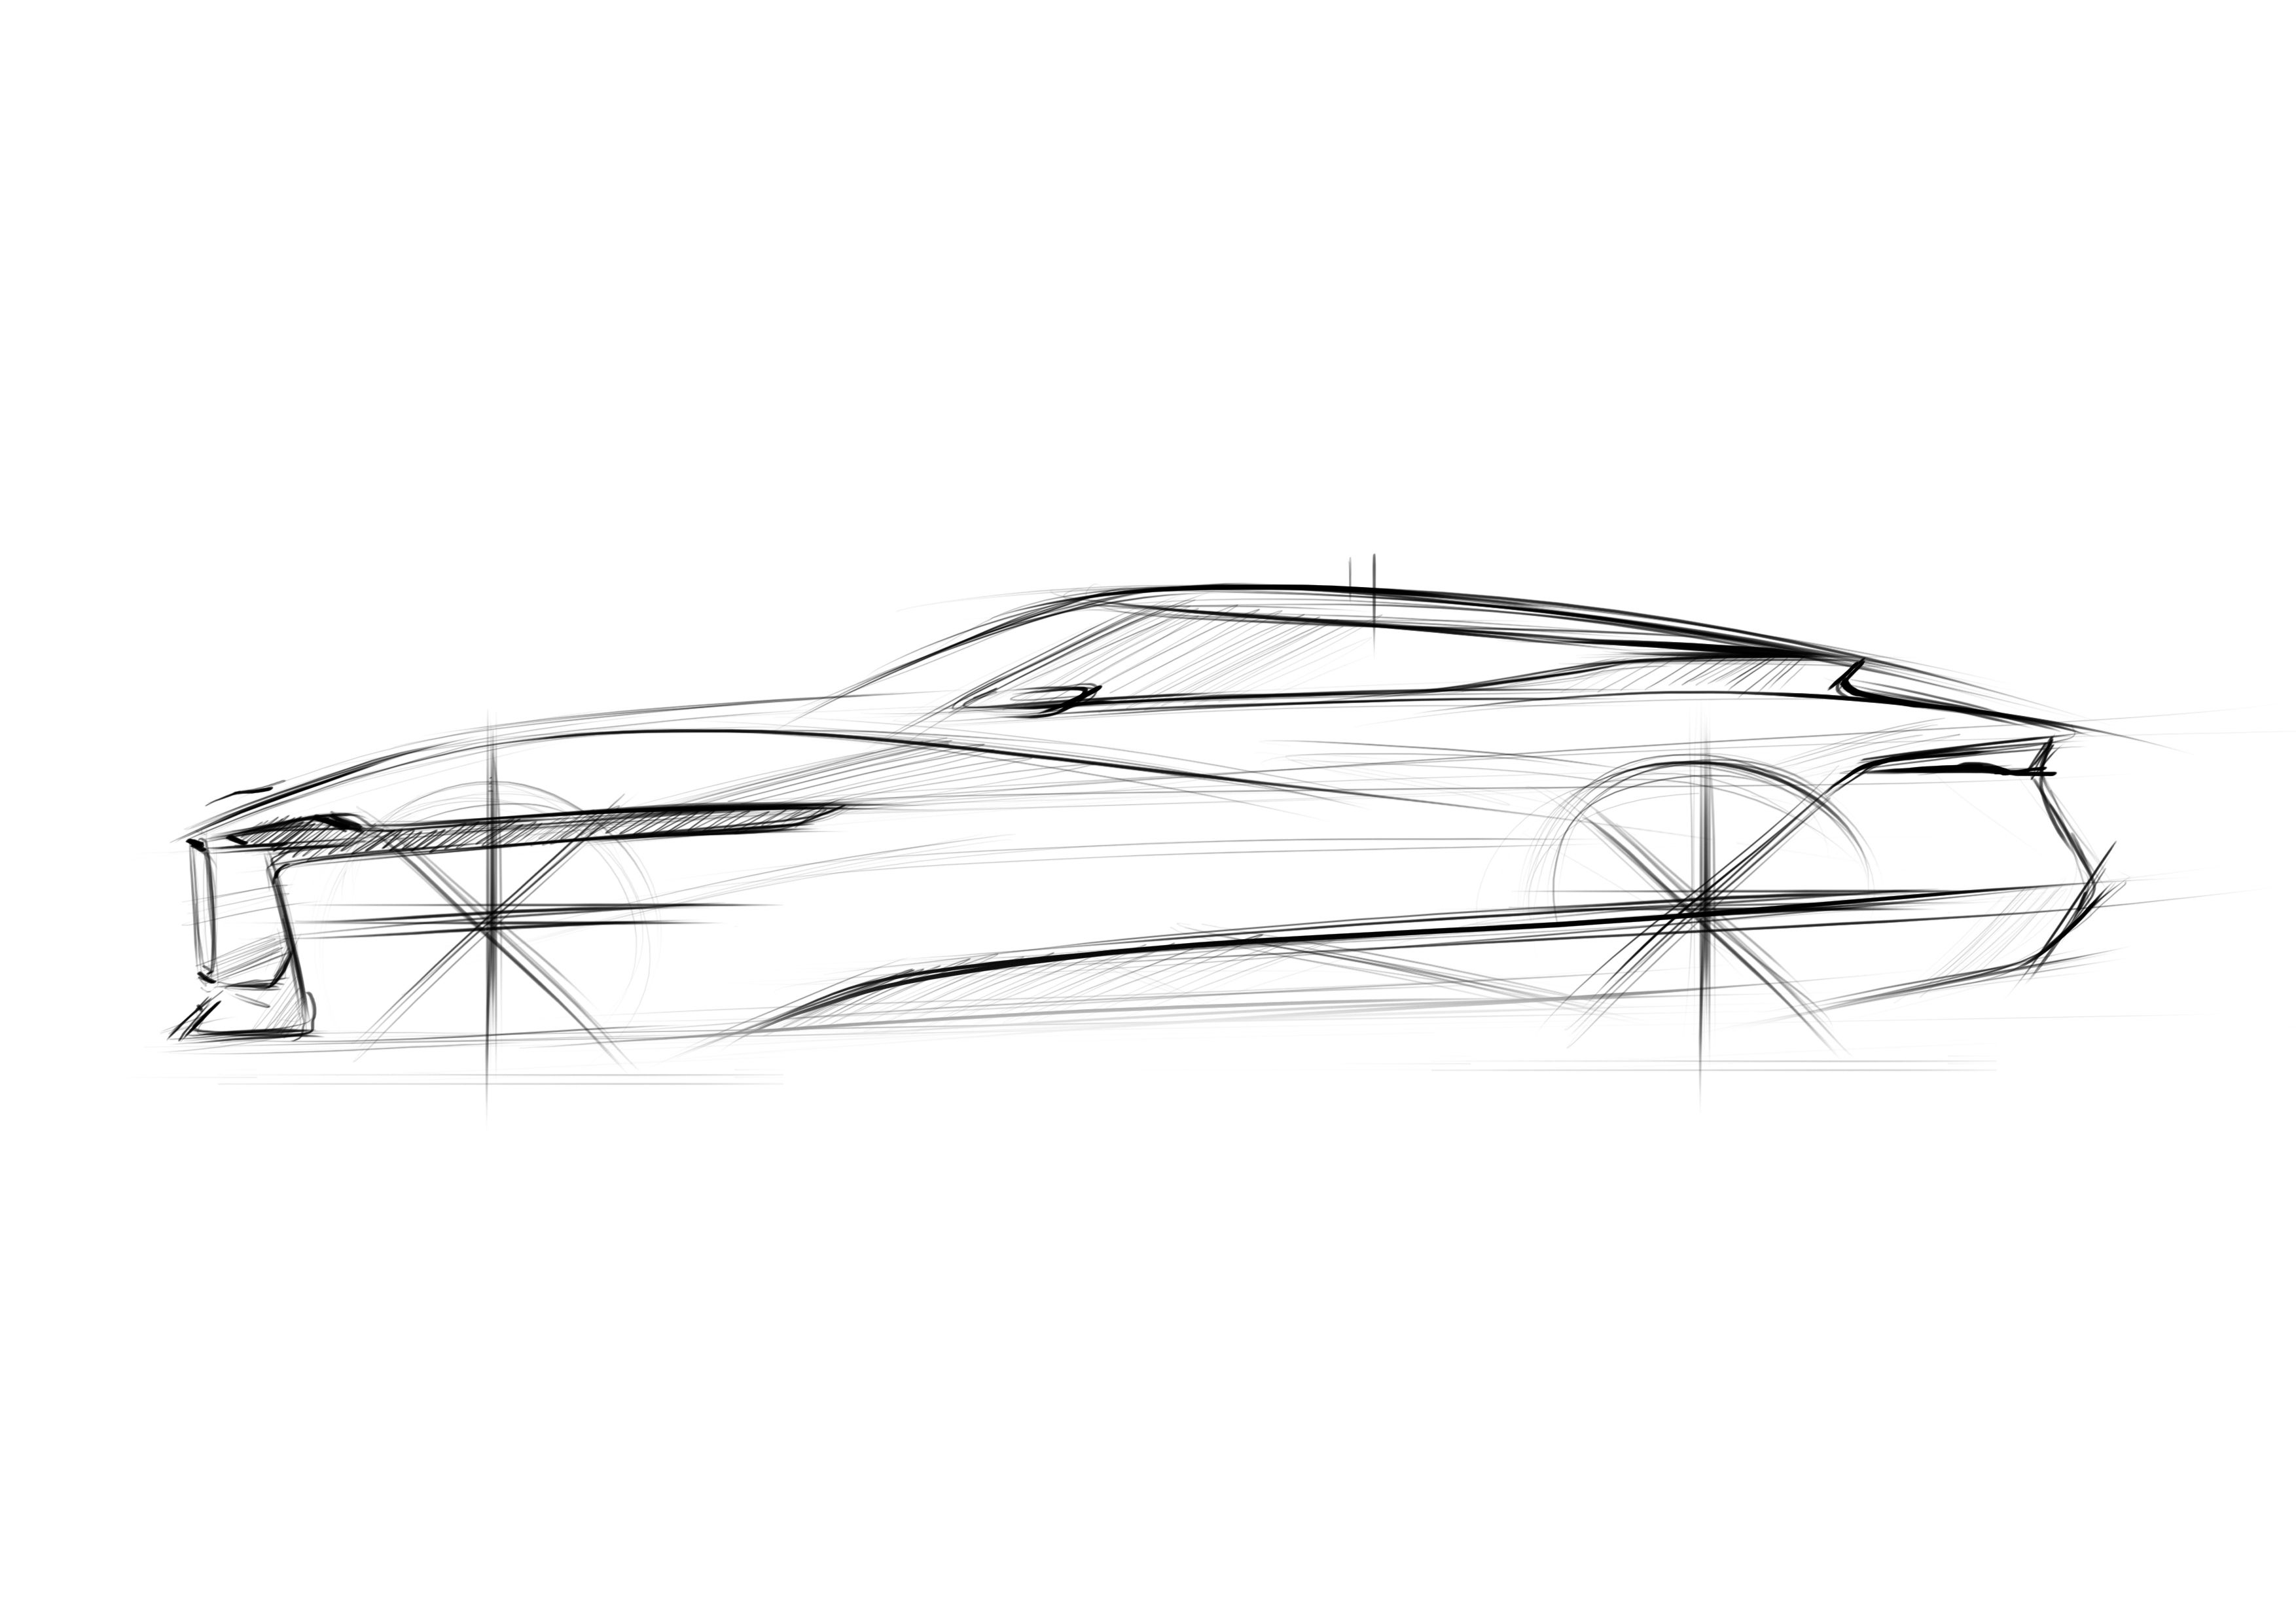 Jaguar E Luxury Concept Luxury Cars Car Design Sketch